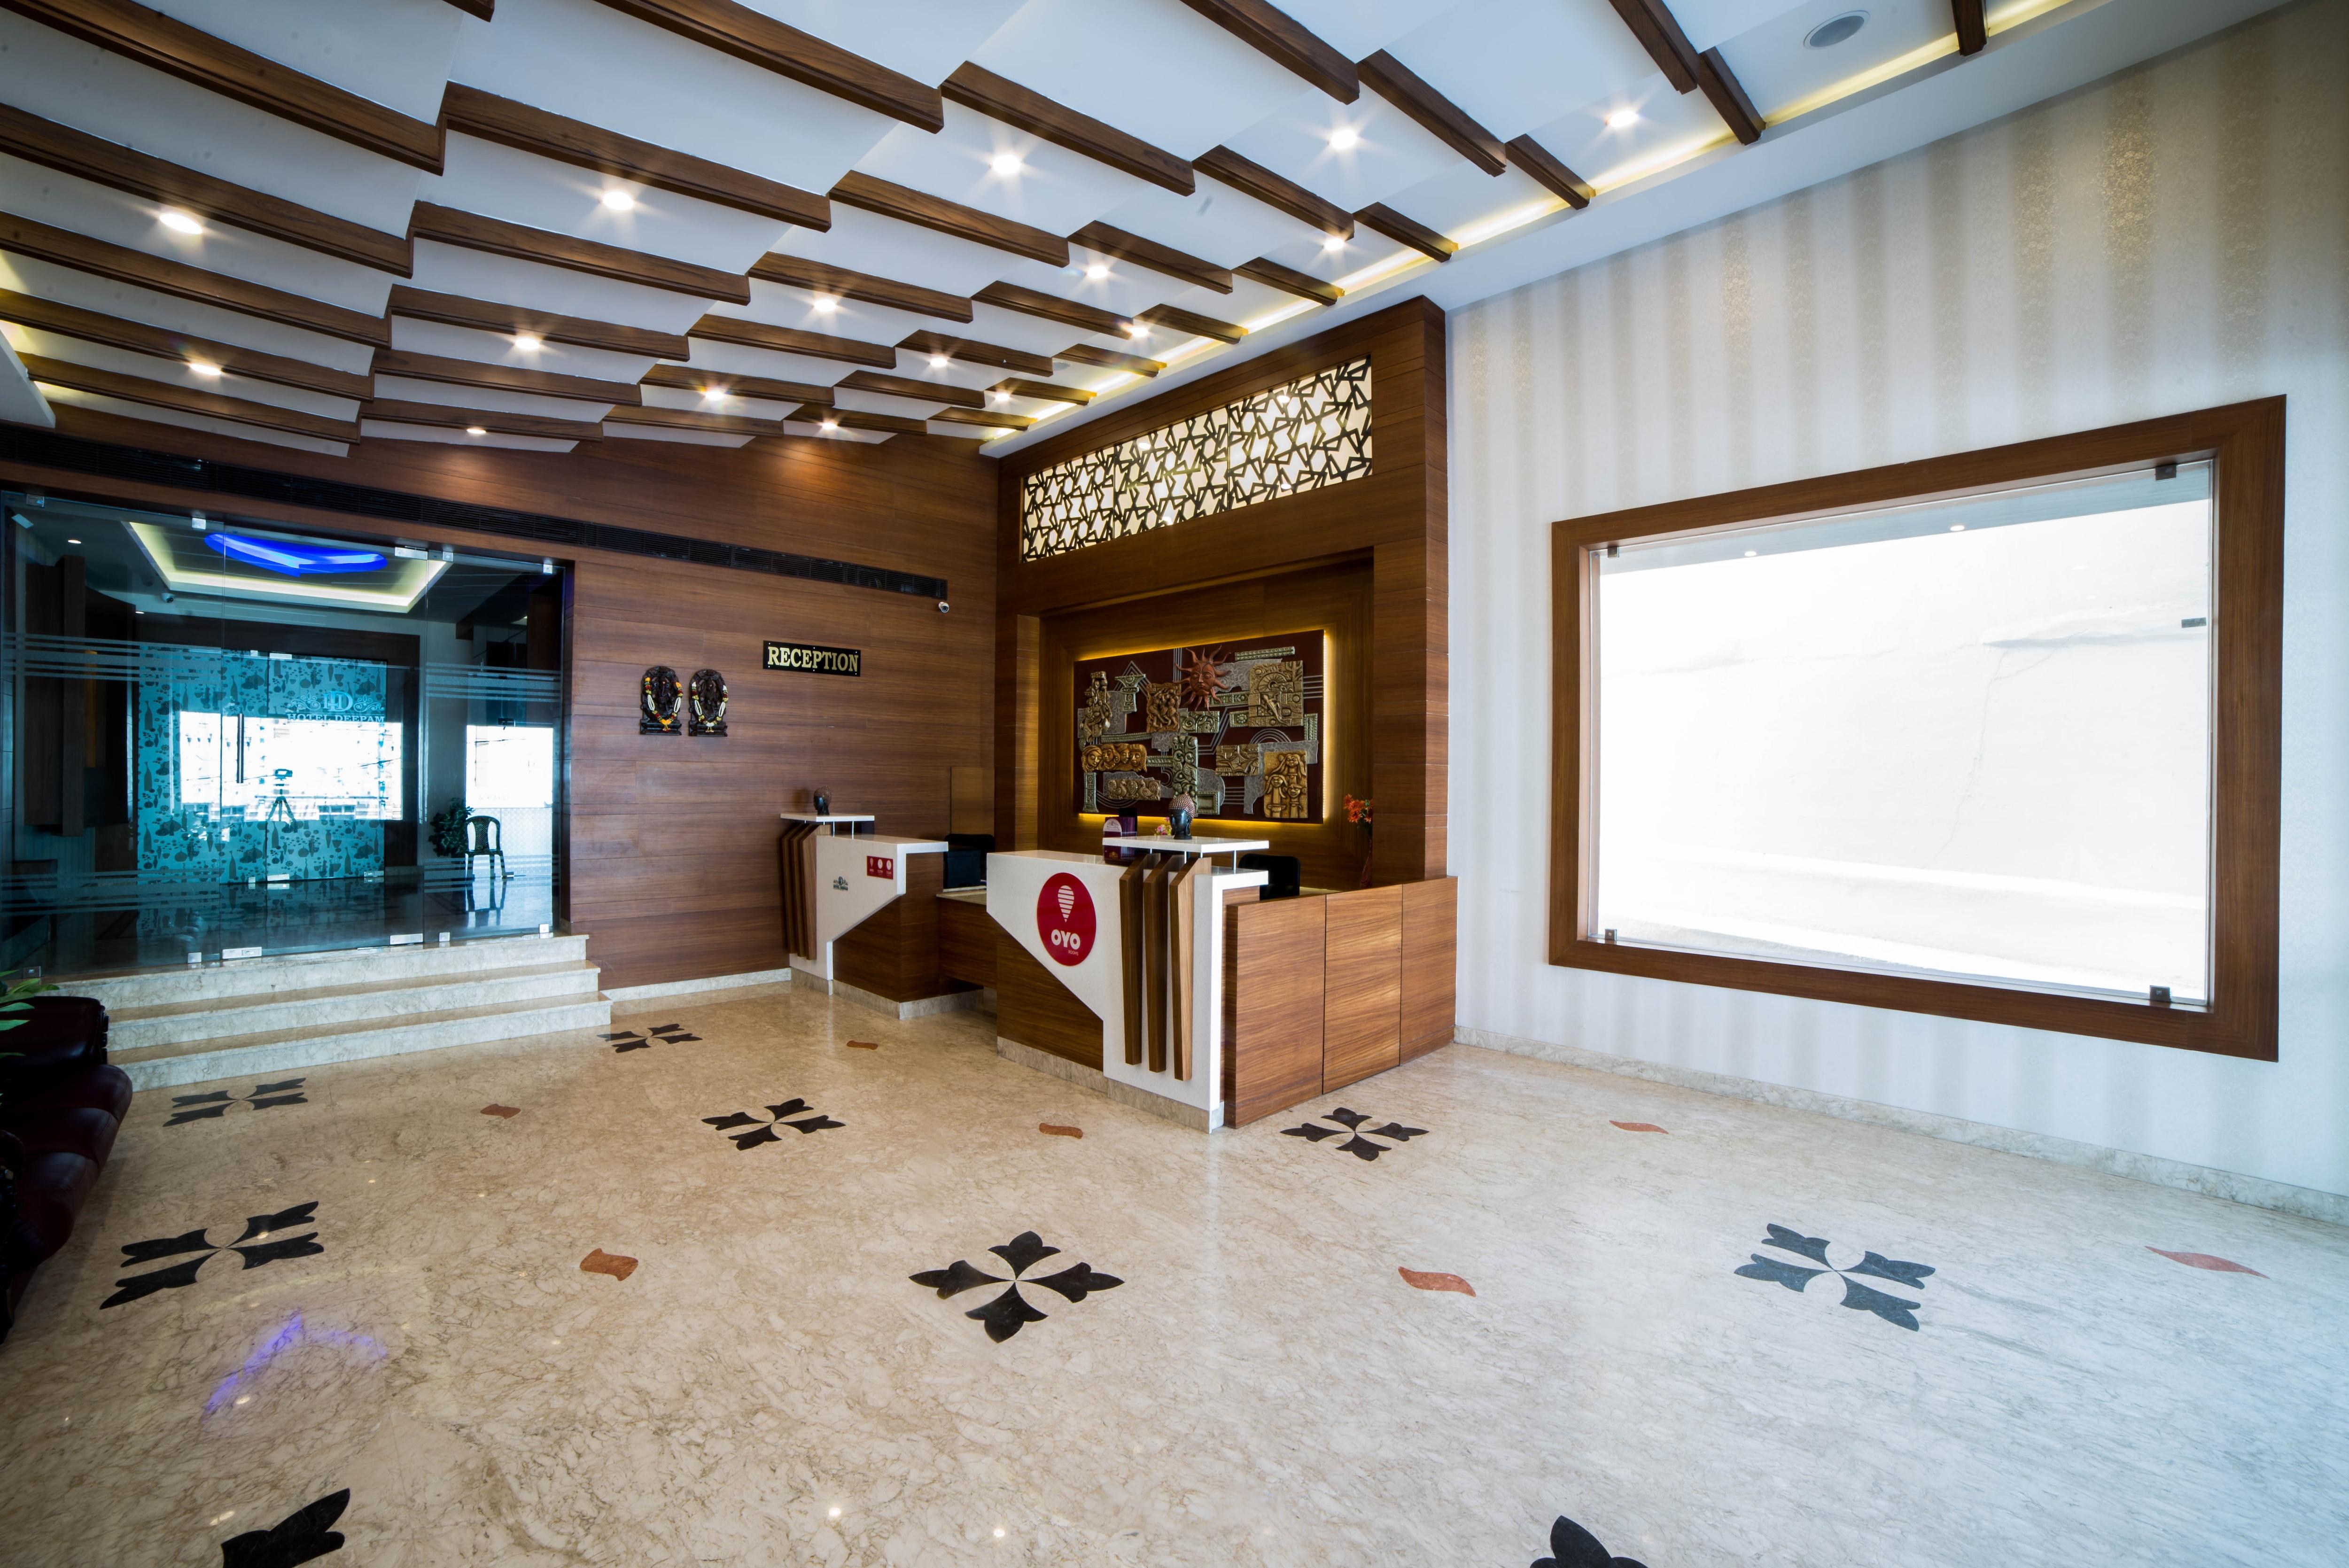 OYO 4450 Hotel Deepam in Tiruchirappalli